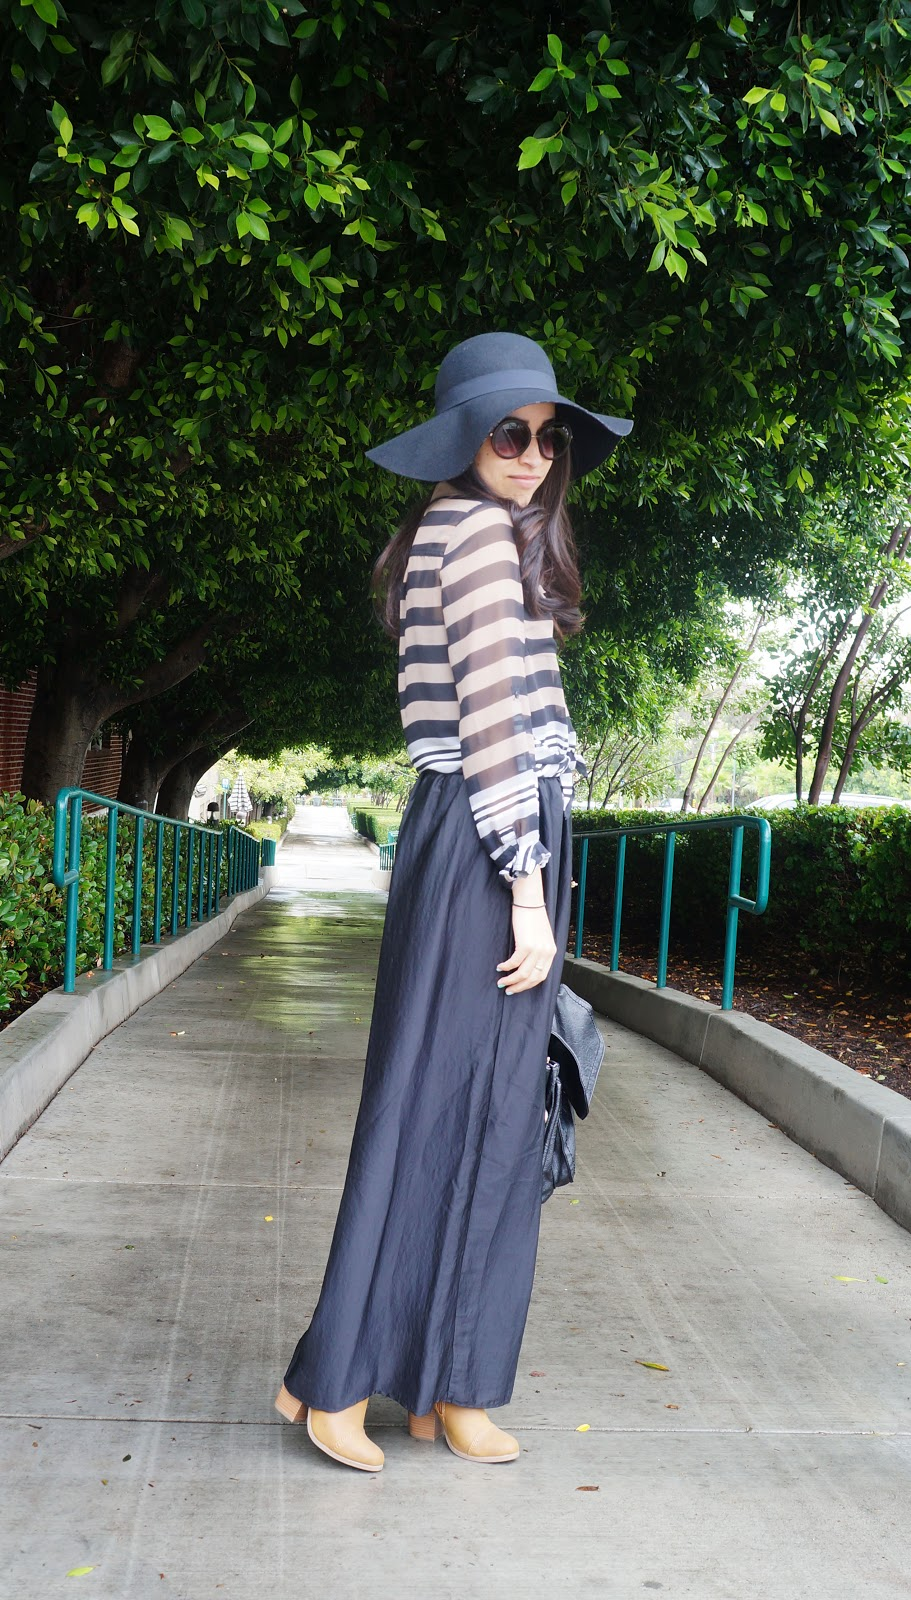 efc6c9ec08 Maxi Skirt: Target, $24.99 | Top: Old Navy, $16.99 | Booties: LC lauren  Conrad | Hat: Apt. 9 | Purse: TJ Maxx | Sunglasses: Nordstrom, $12